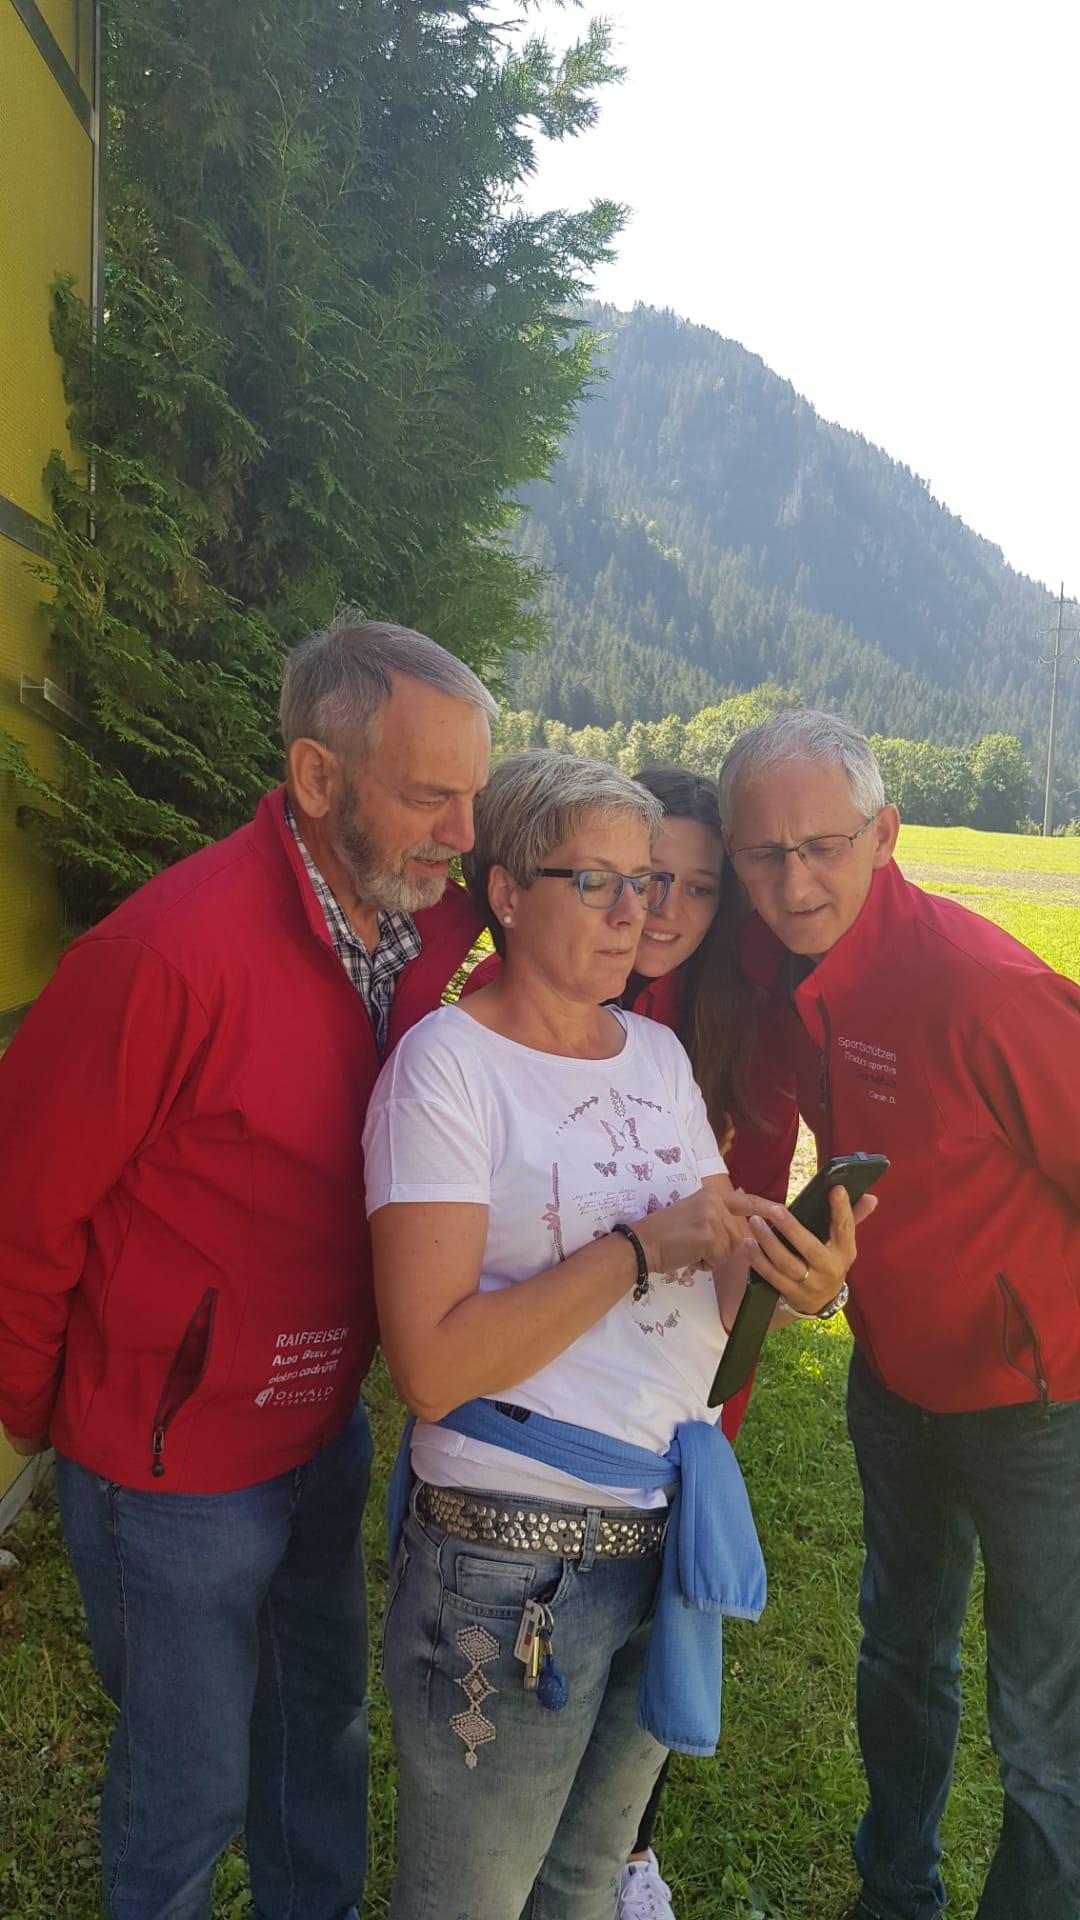 Bezirksmatchfinal 2019 in Pardiala v.l. Guido, Brida B., Nadja, Corsin D.